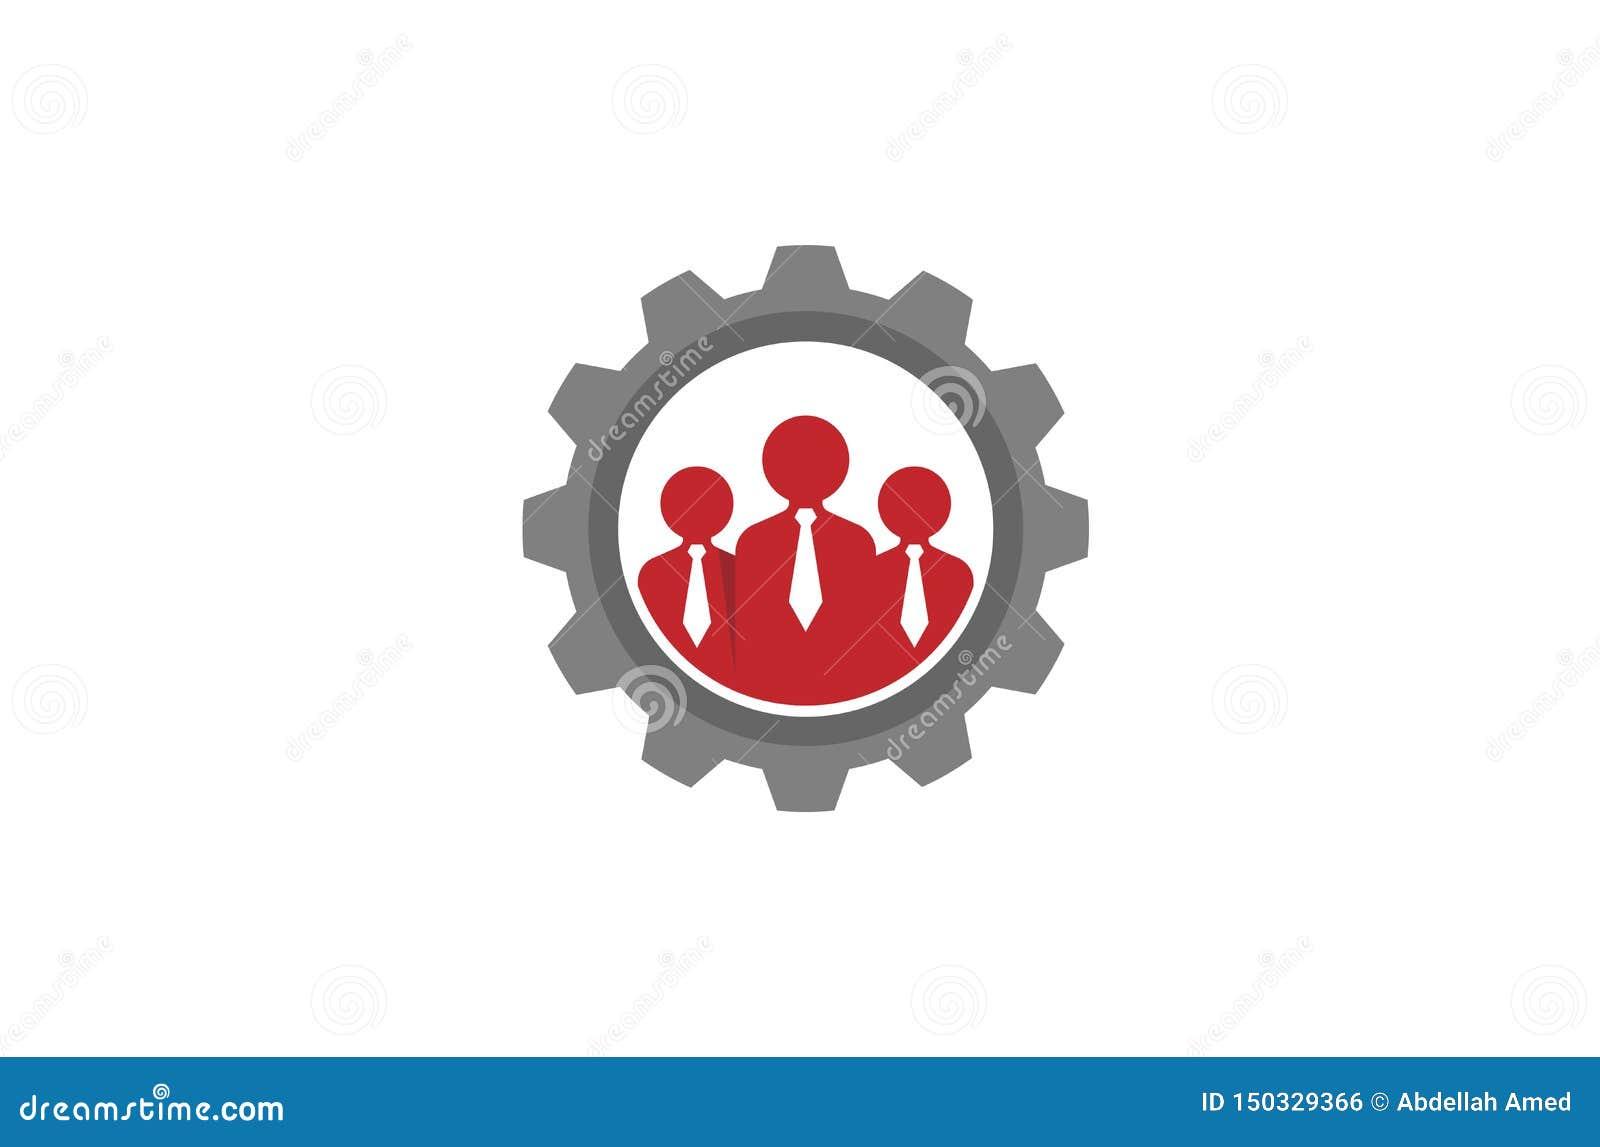 Tre persone creative Team Gear Logo Design Illustration